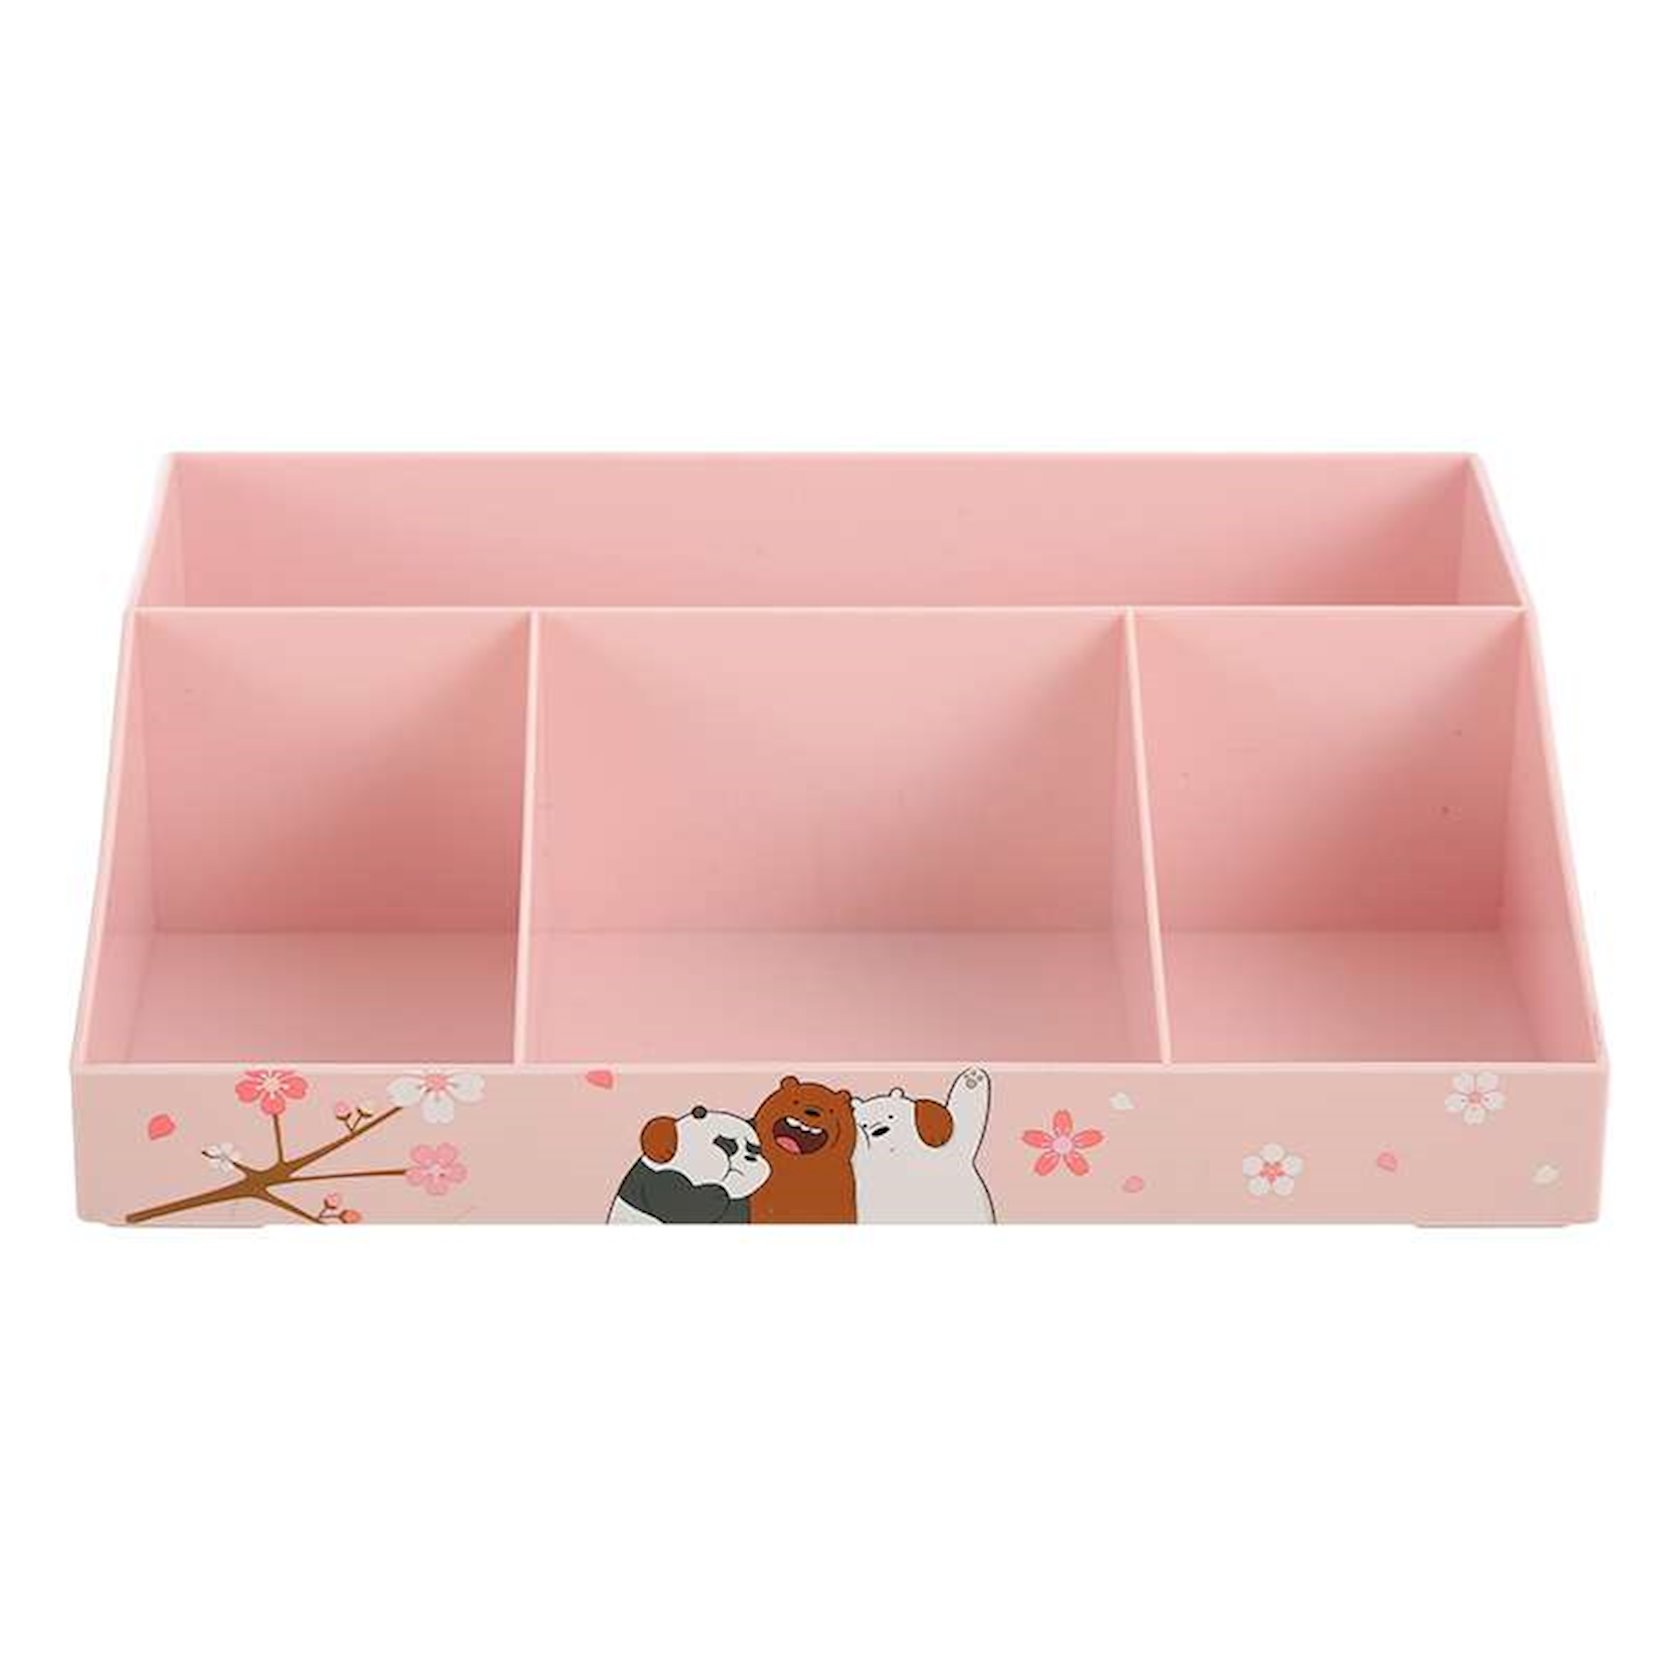 Saxlama qutusu Miniso We Bare Bears Multifunctional Storage Box